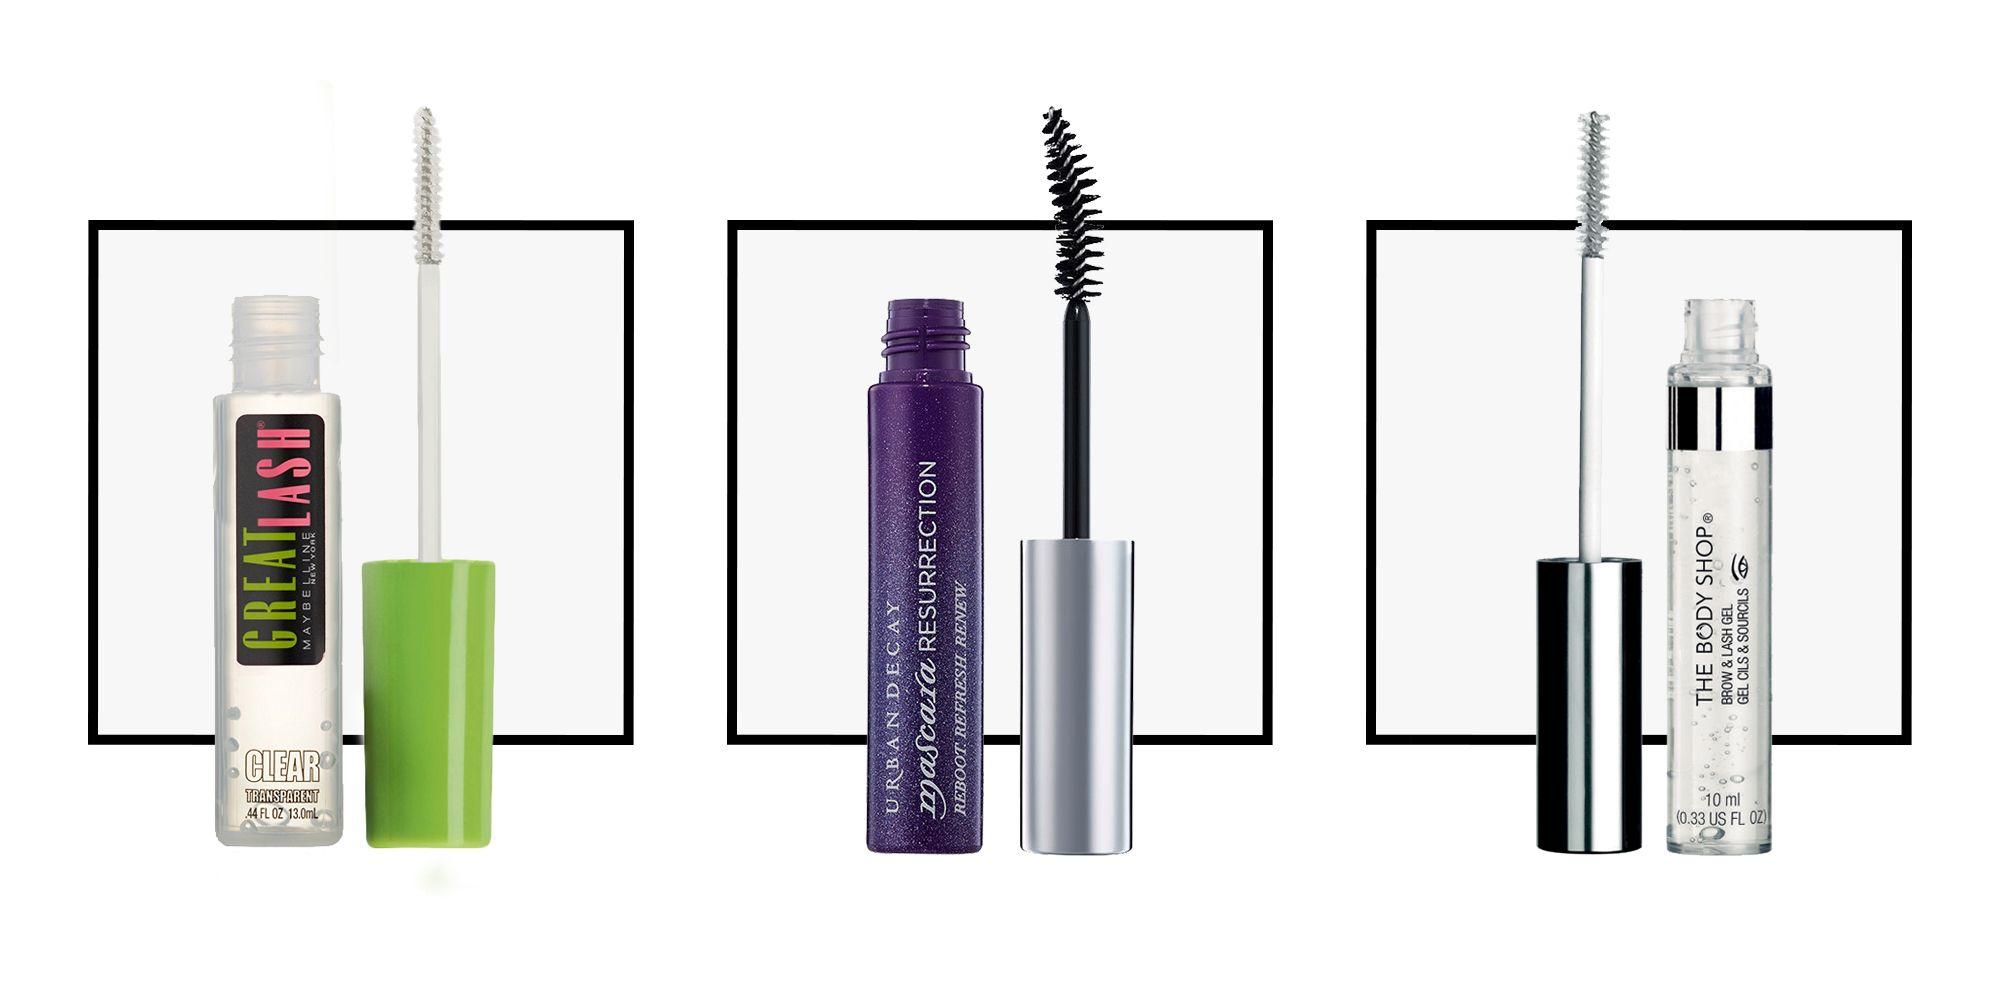 6b5f9e2d66c 5 Best Clear Mascaras - Top Clear Mascara Brands